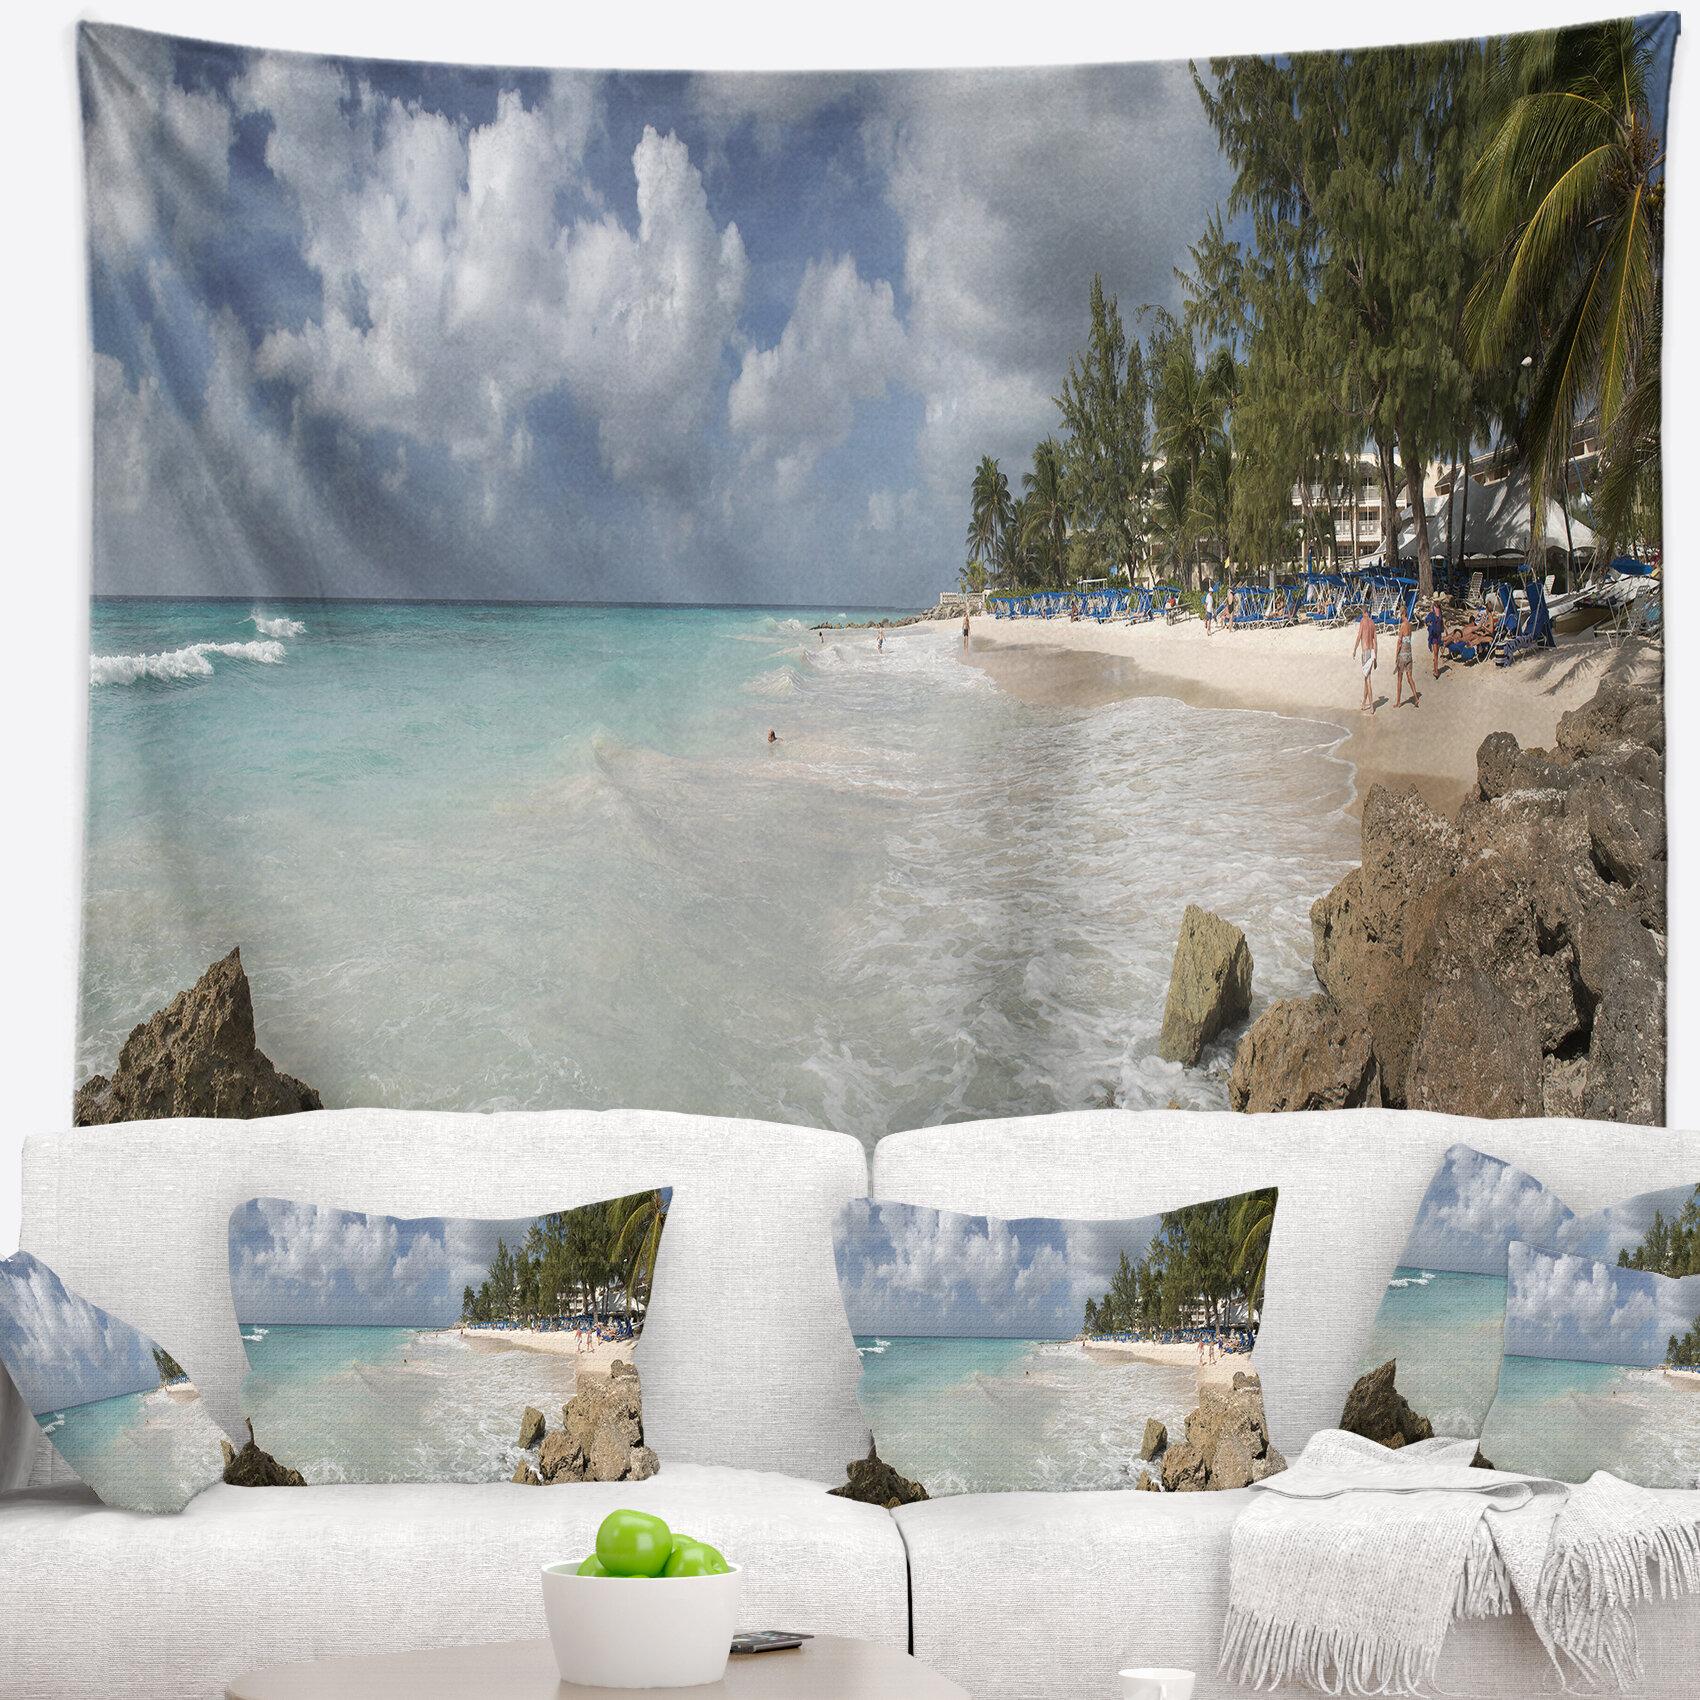 East Urban Home Seascape Barbados Island White Seashore